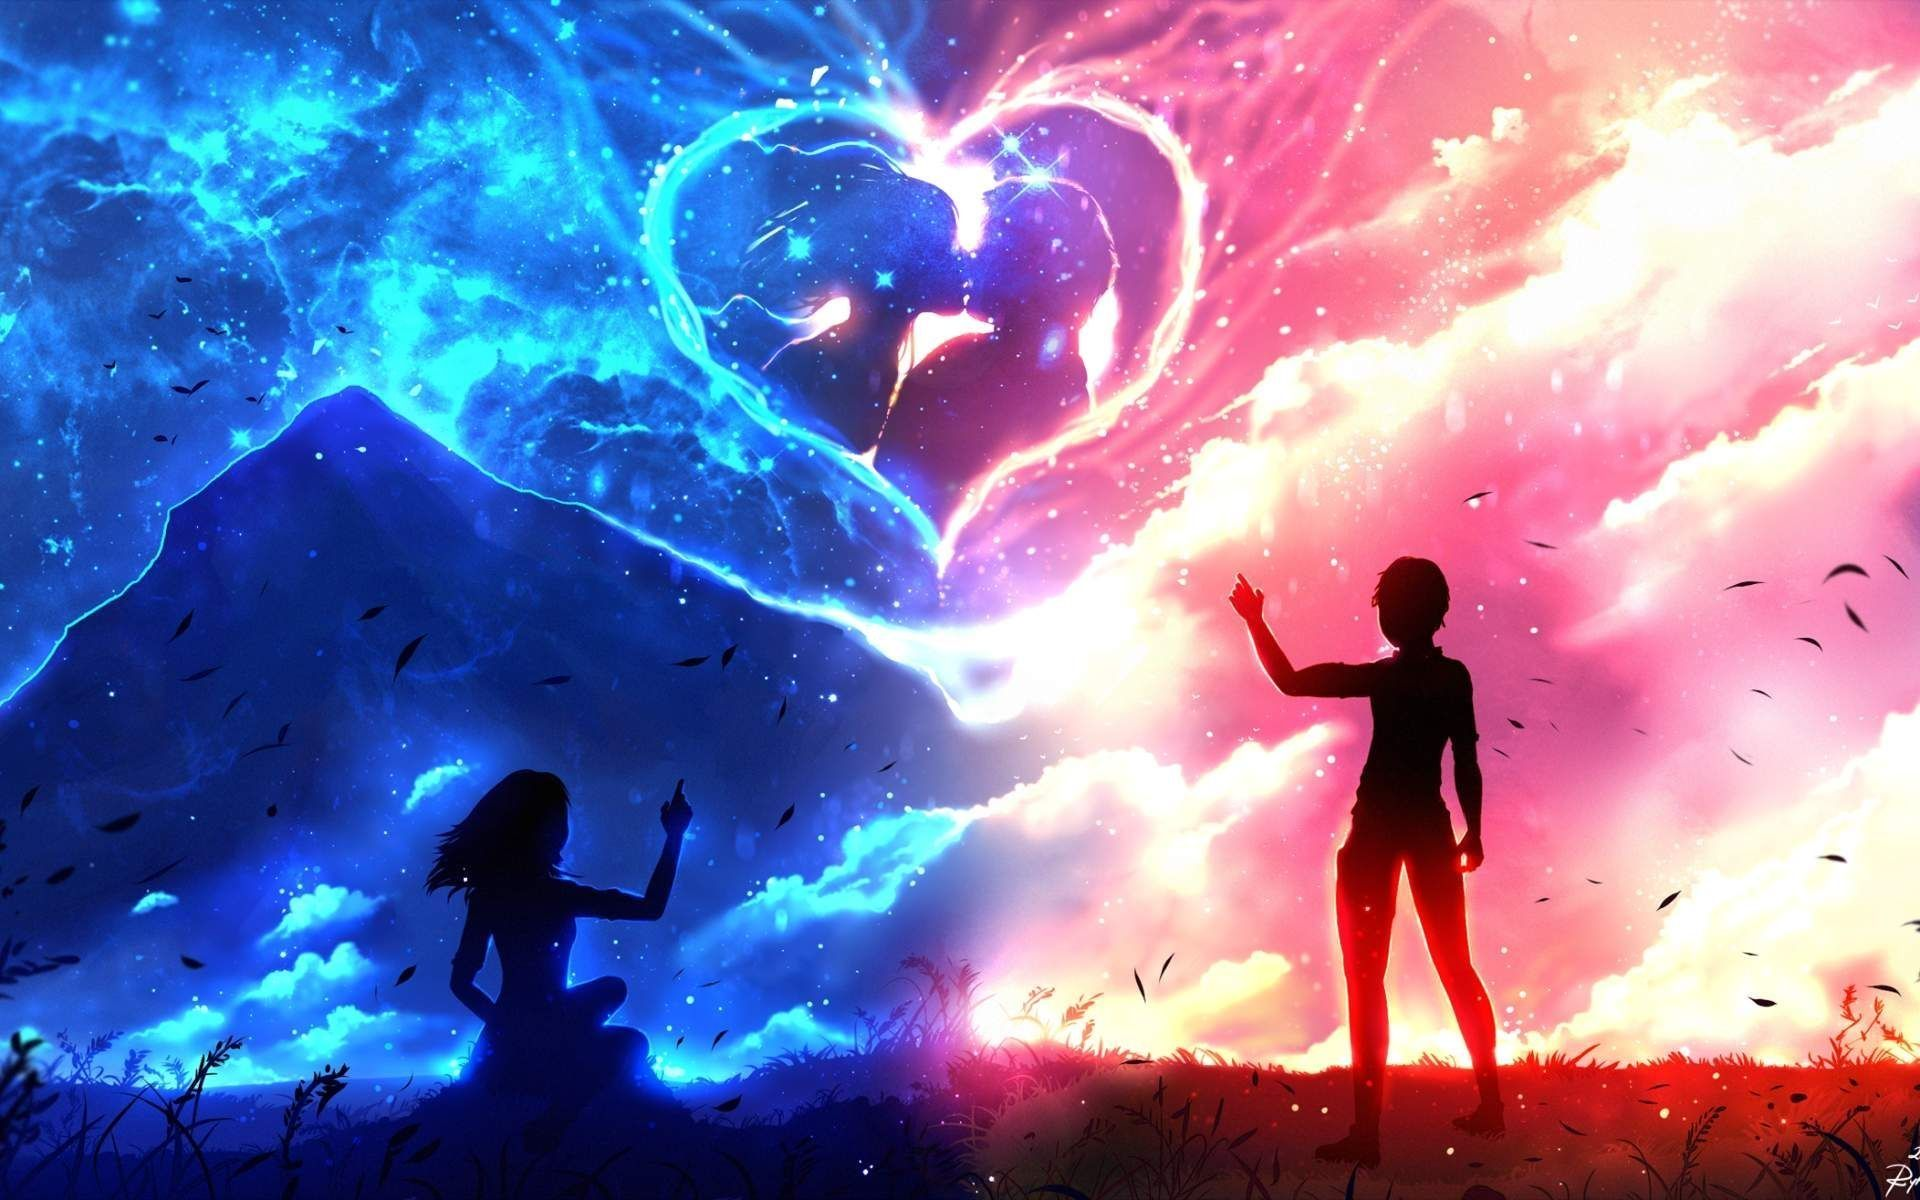 Love Anime Wallpapers Top Free Love Anime Backgrounds In Cartoon Lovers Wallpapers Hd Anime Background Anime Wallpaper Anime Love